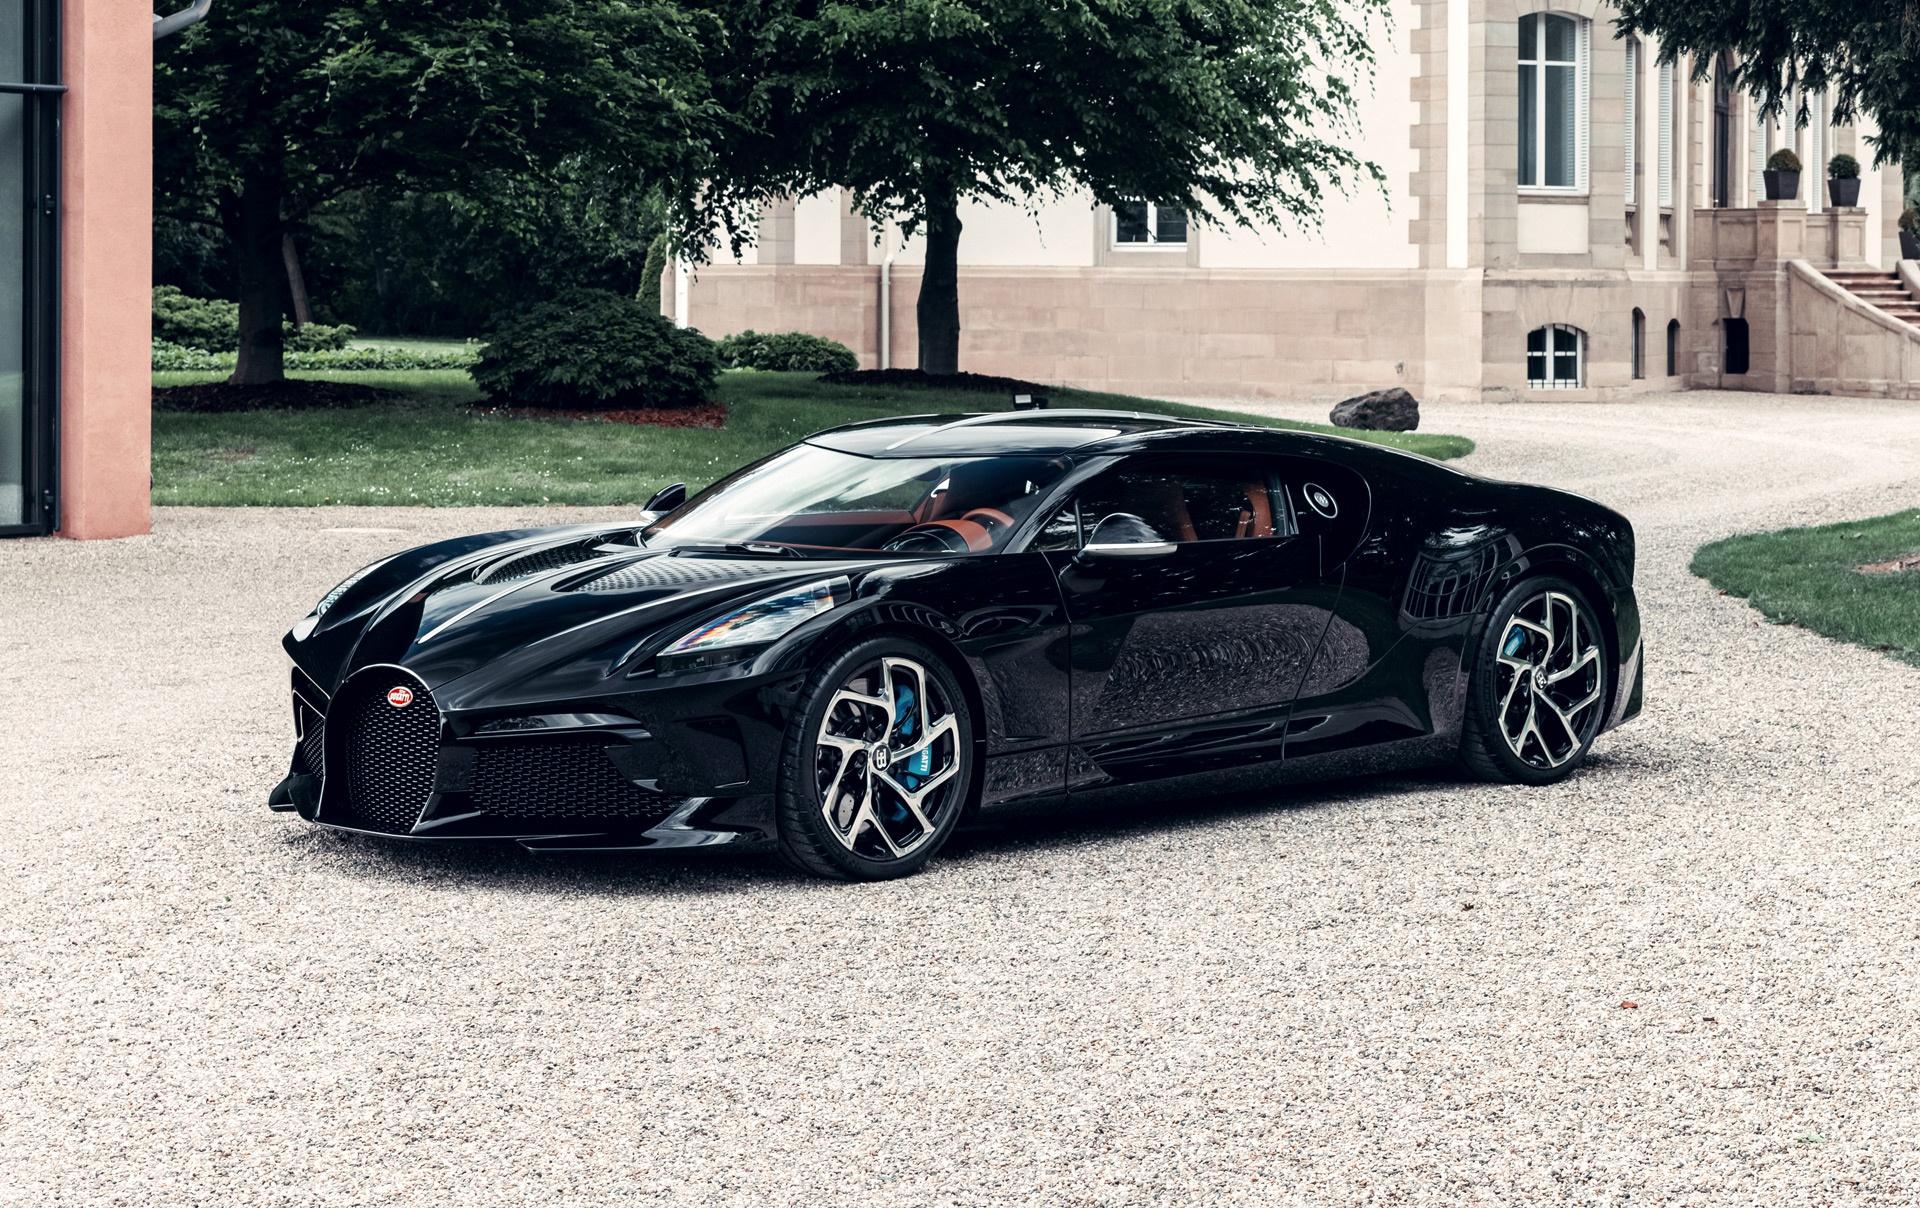 Bugatti La Voiture Noire duoc giao cho khach hang anh 1